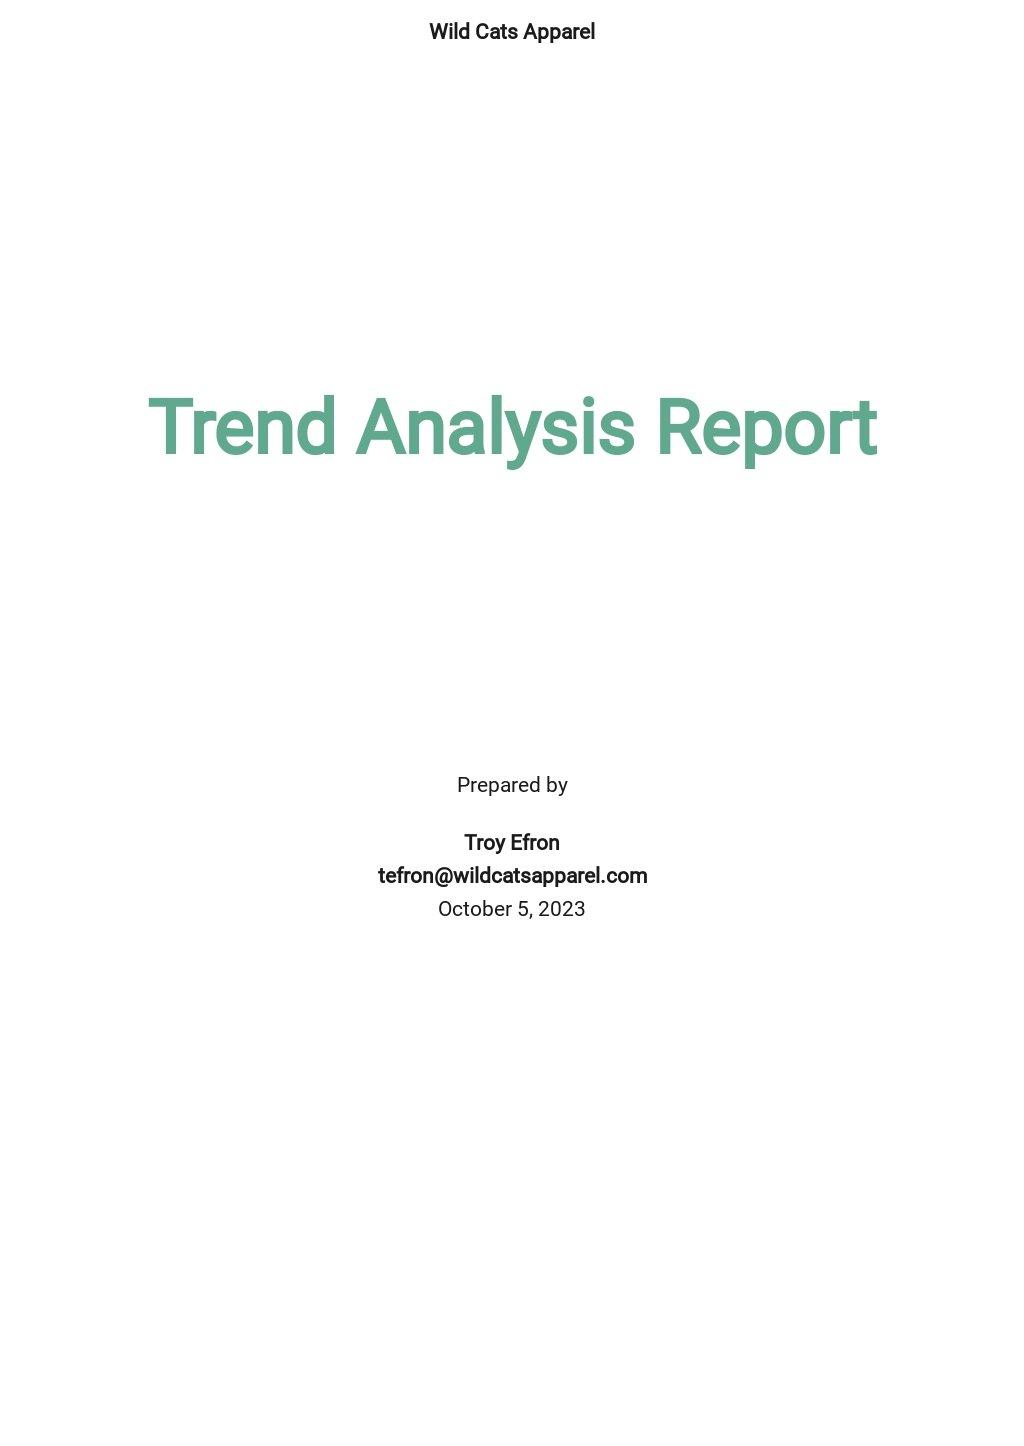 Trend Analysis Report Template.jpe